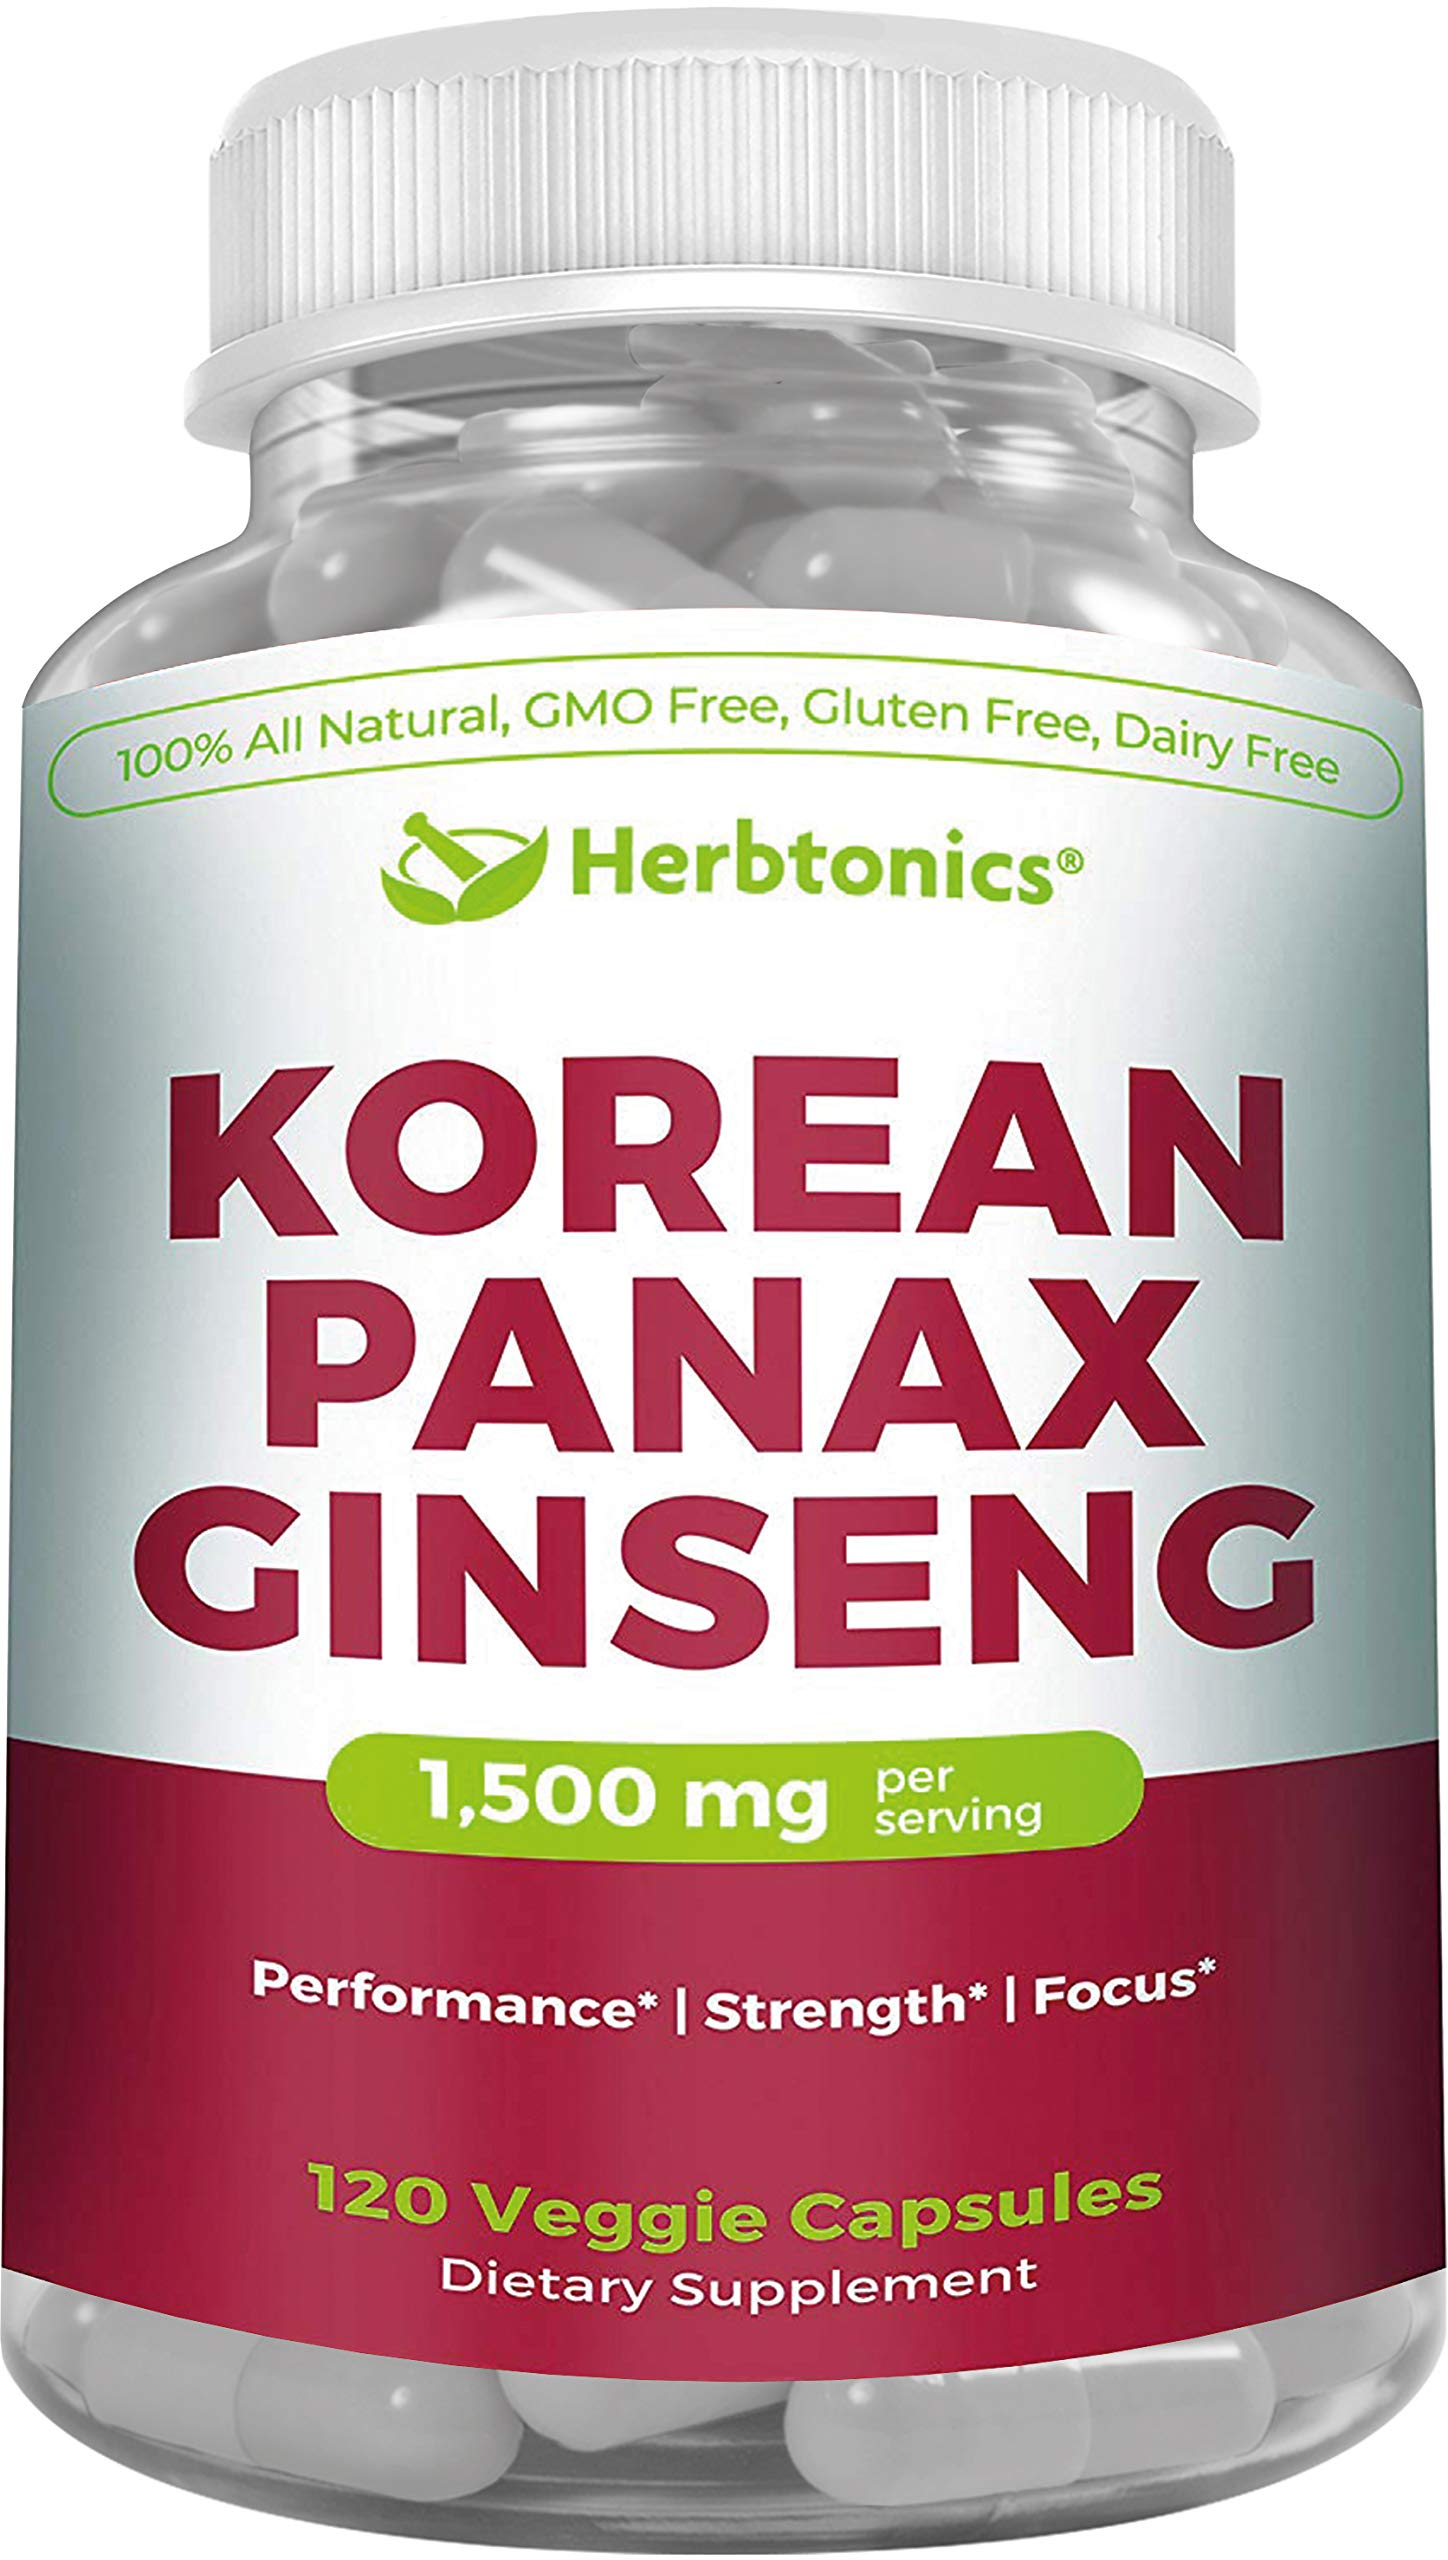 High Strength Korean Red Panax Ginseng Capsules 1500 mg Supplement -120 Vegan Pills High Ginsenosides Powder Extract to Boost Energy, Endurance, Mood, Performance